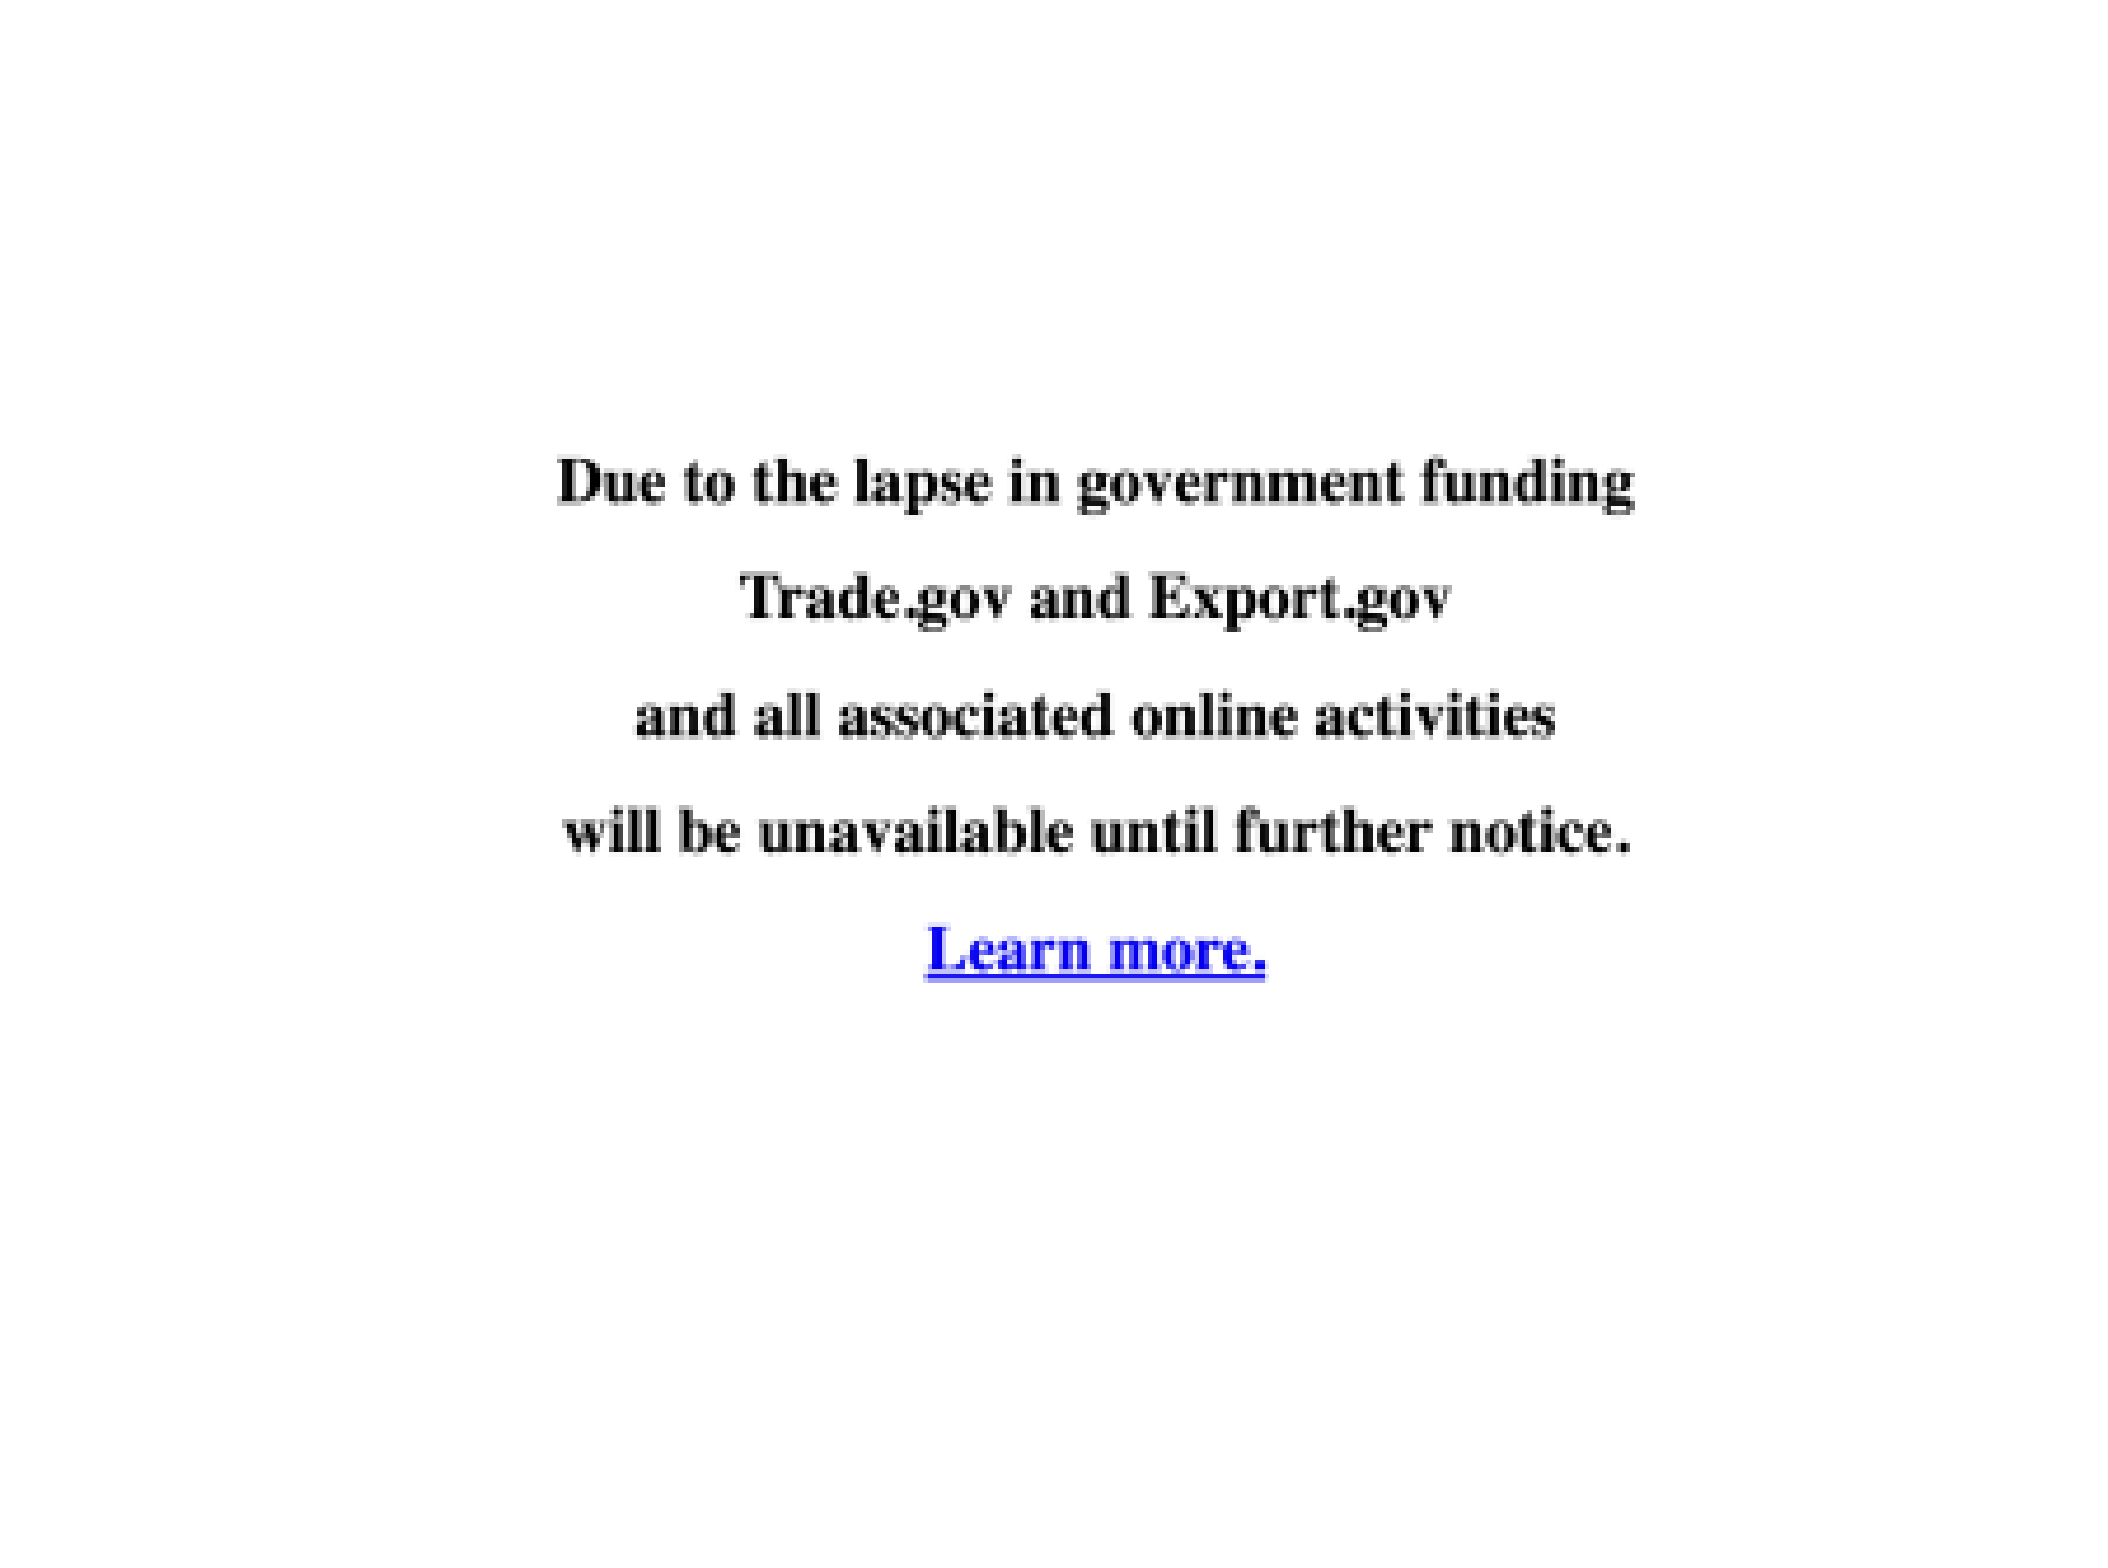 Government websites' 2018 shutdown warnings, ranked — Quartz